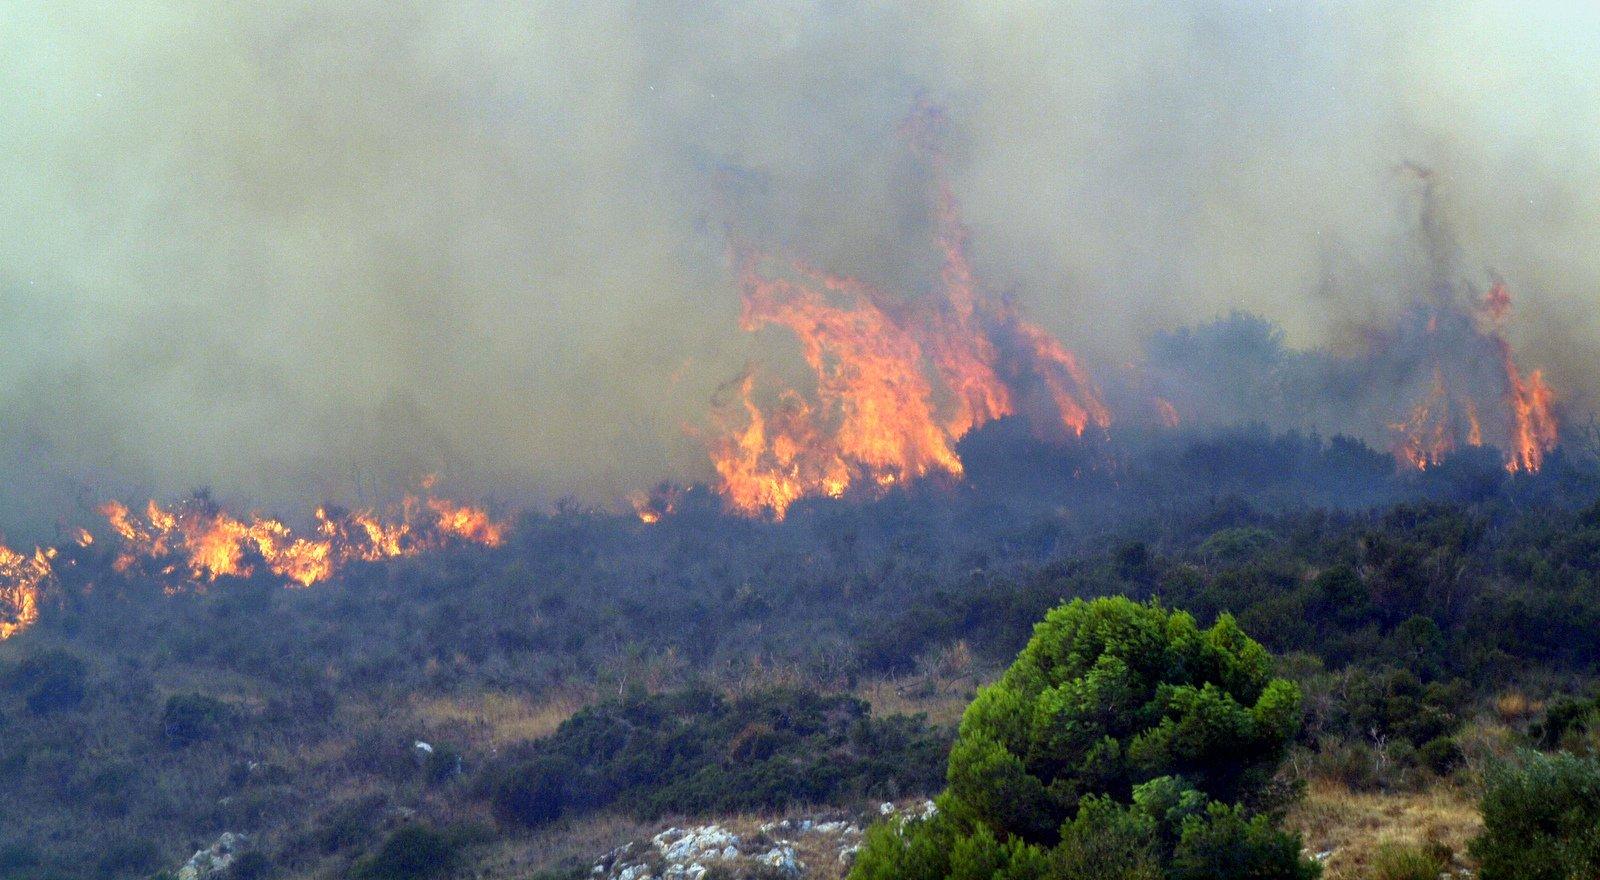 Emploi_du_feu_Vigilance_Incendie DPFM